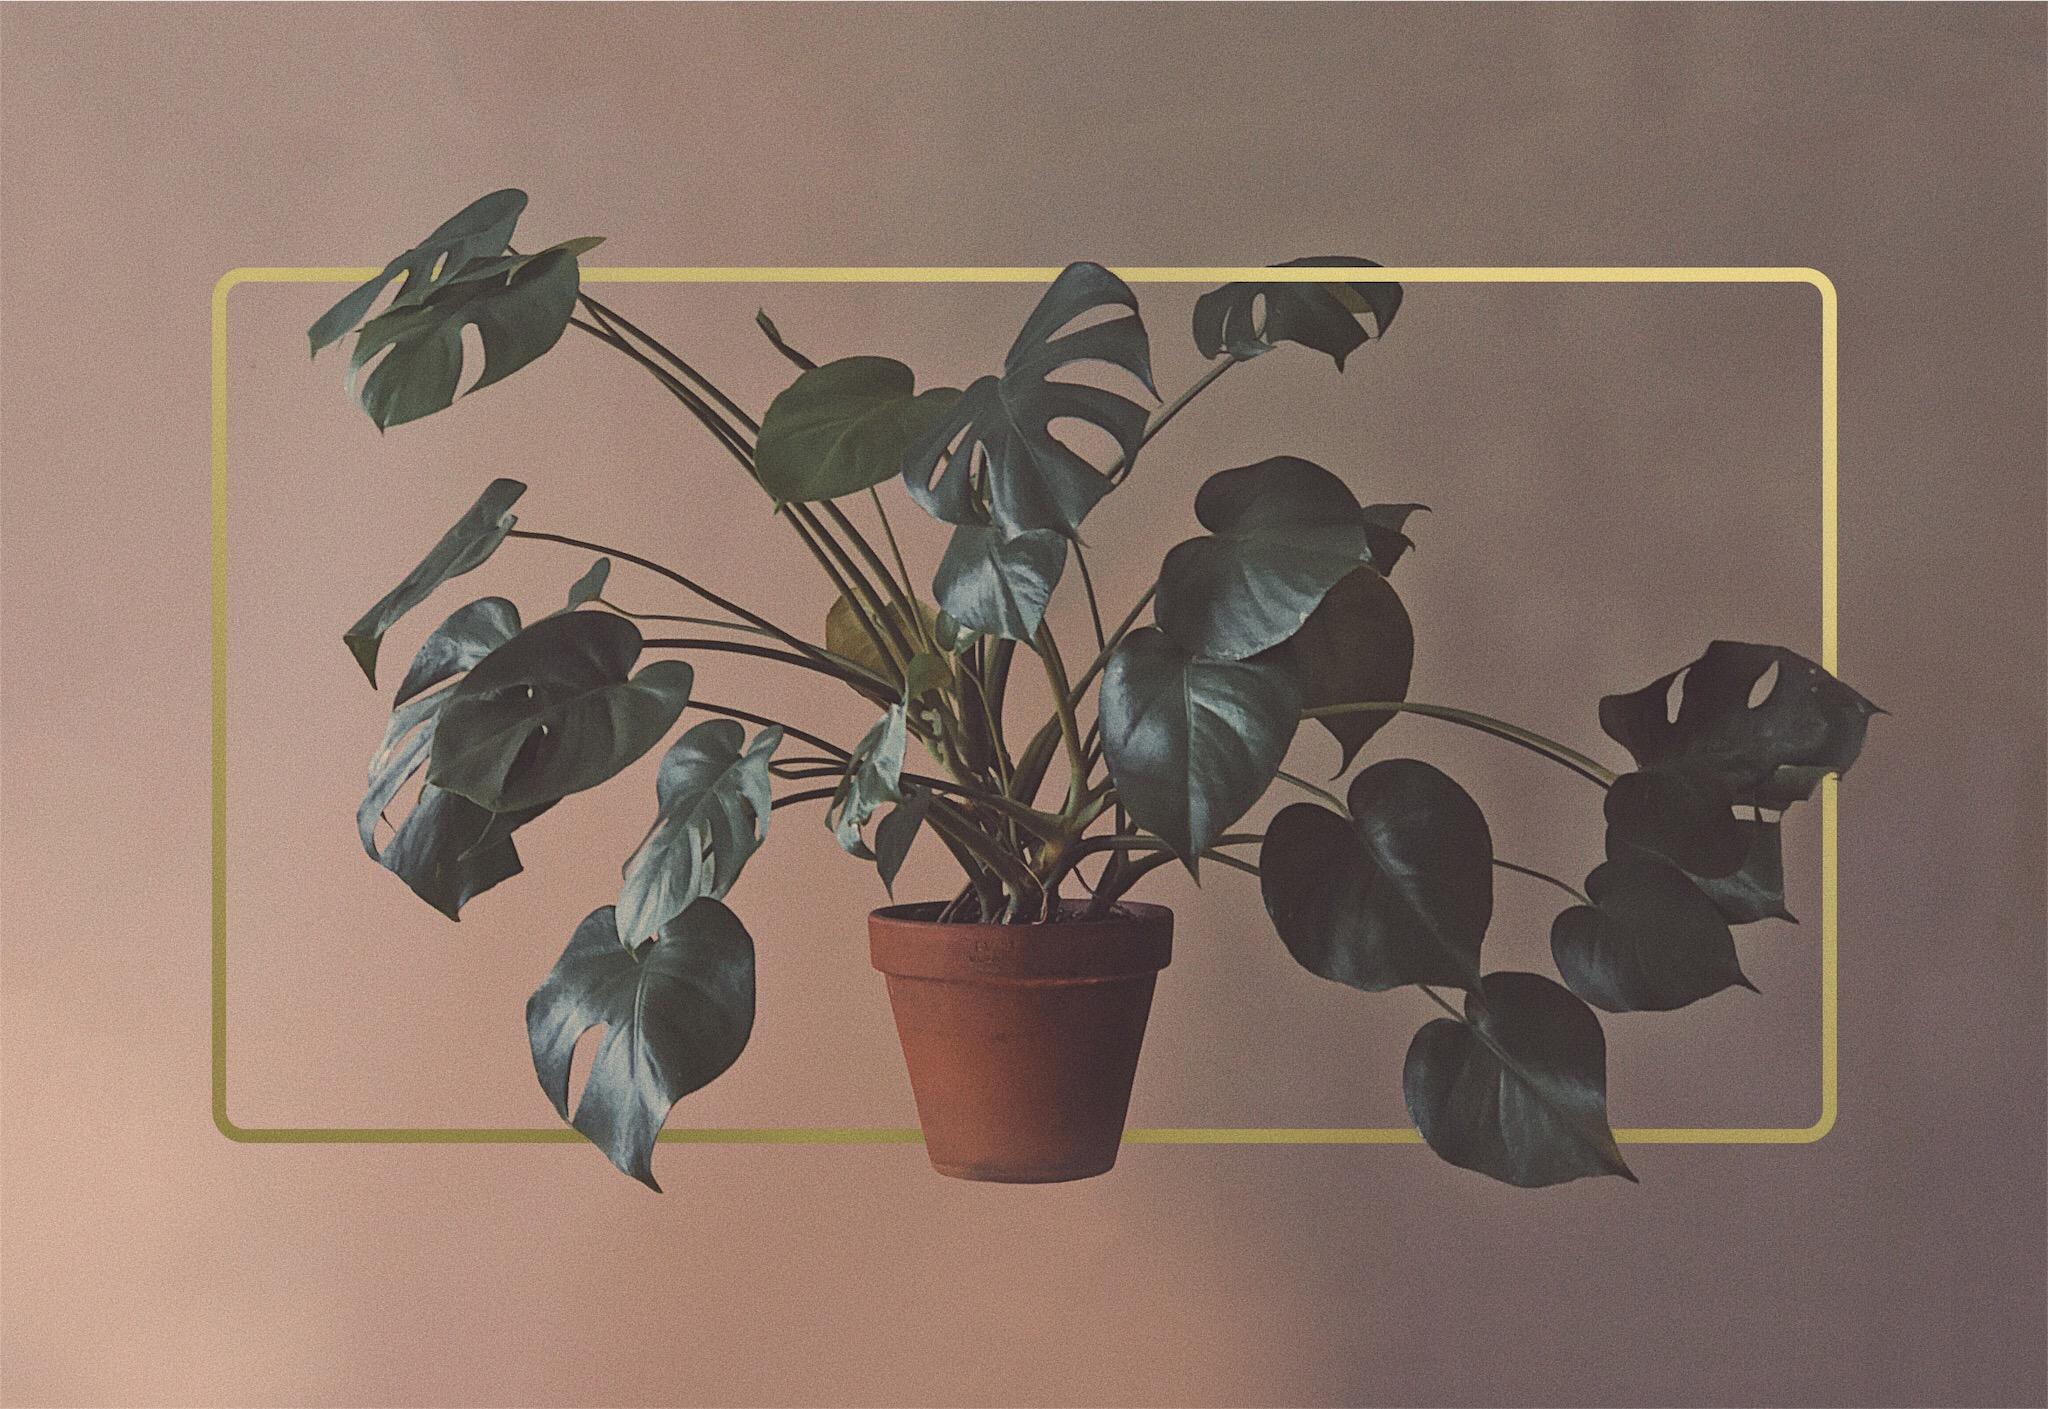 Plant Organic Composition Gold Aesthetic Minimal Retro Frame Highlight Design Acposterdesign Djibirov Vsco